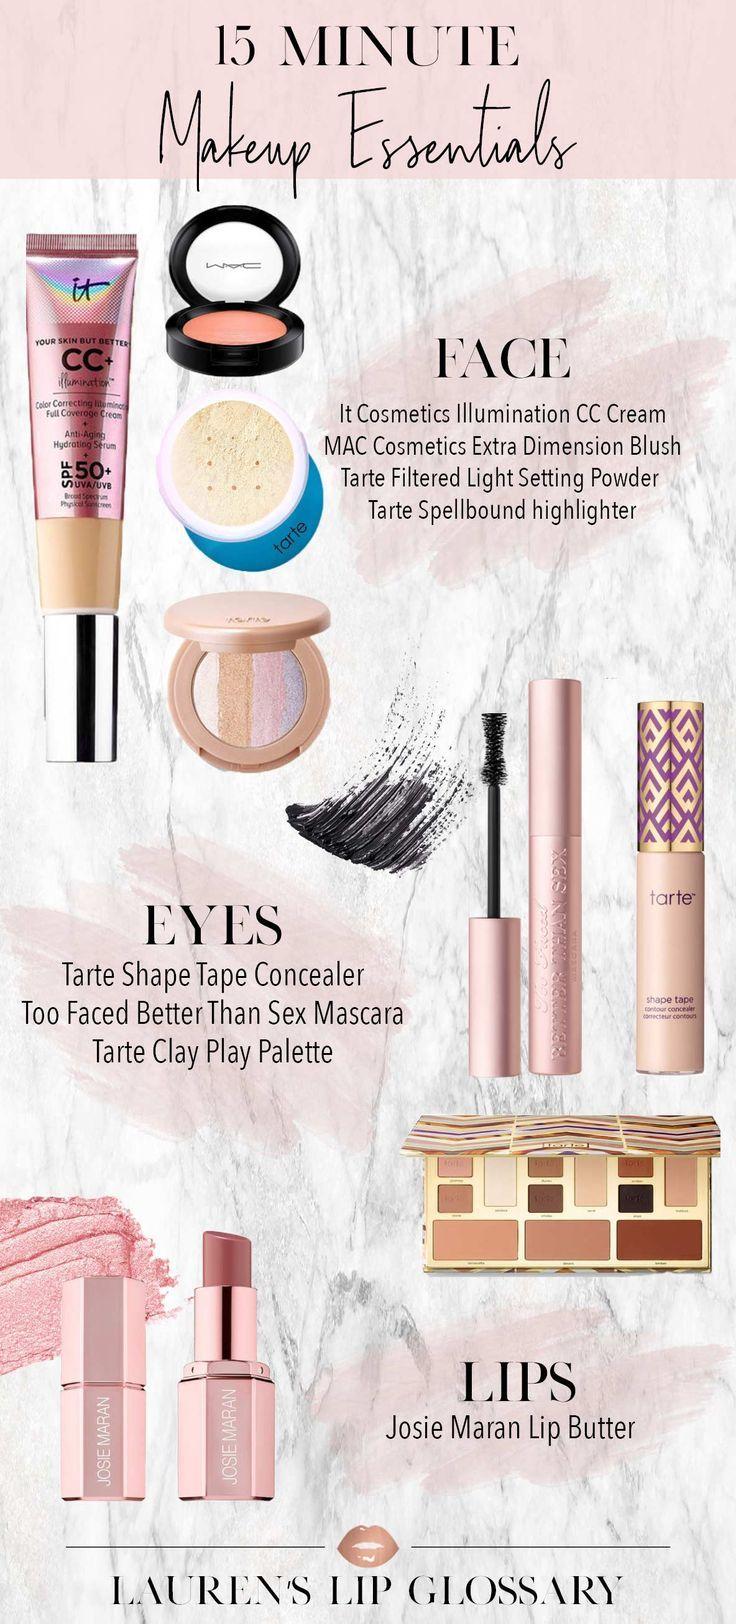 15 Minute Makeup Essentials Lauren S Lip Glossary Makeup Essentials Tarte Shape Tape Concealer Shape Tape Concealer